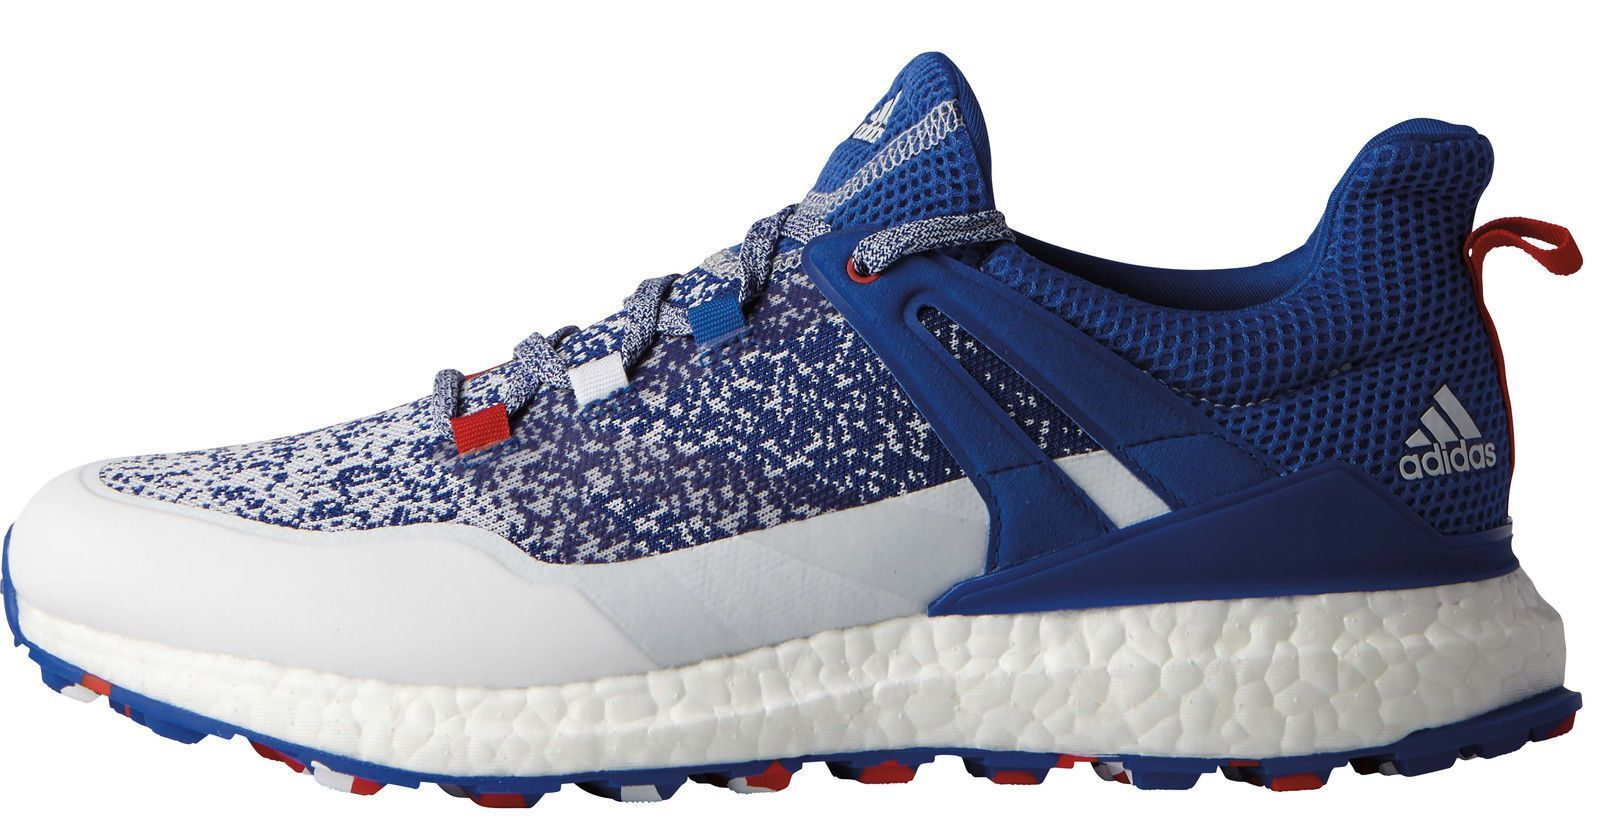 Adidas crossknit db1419 impulso scarpe da golf db1419 crossknit blu / bianco / rosso usa limited f277e8